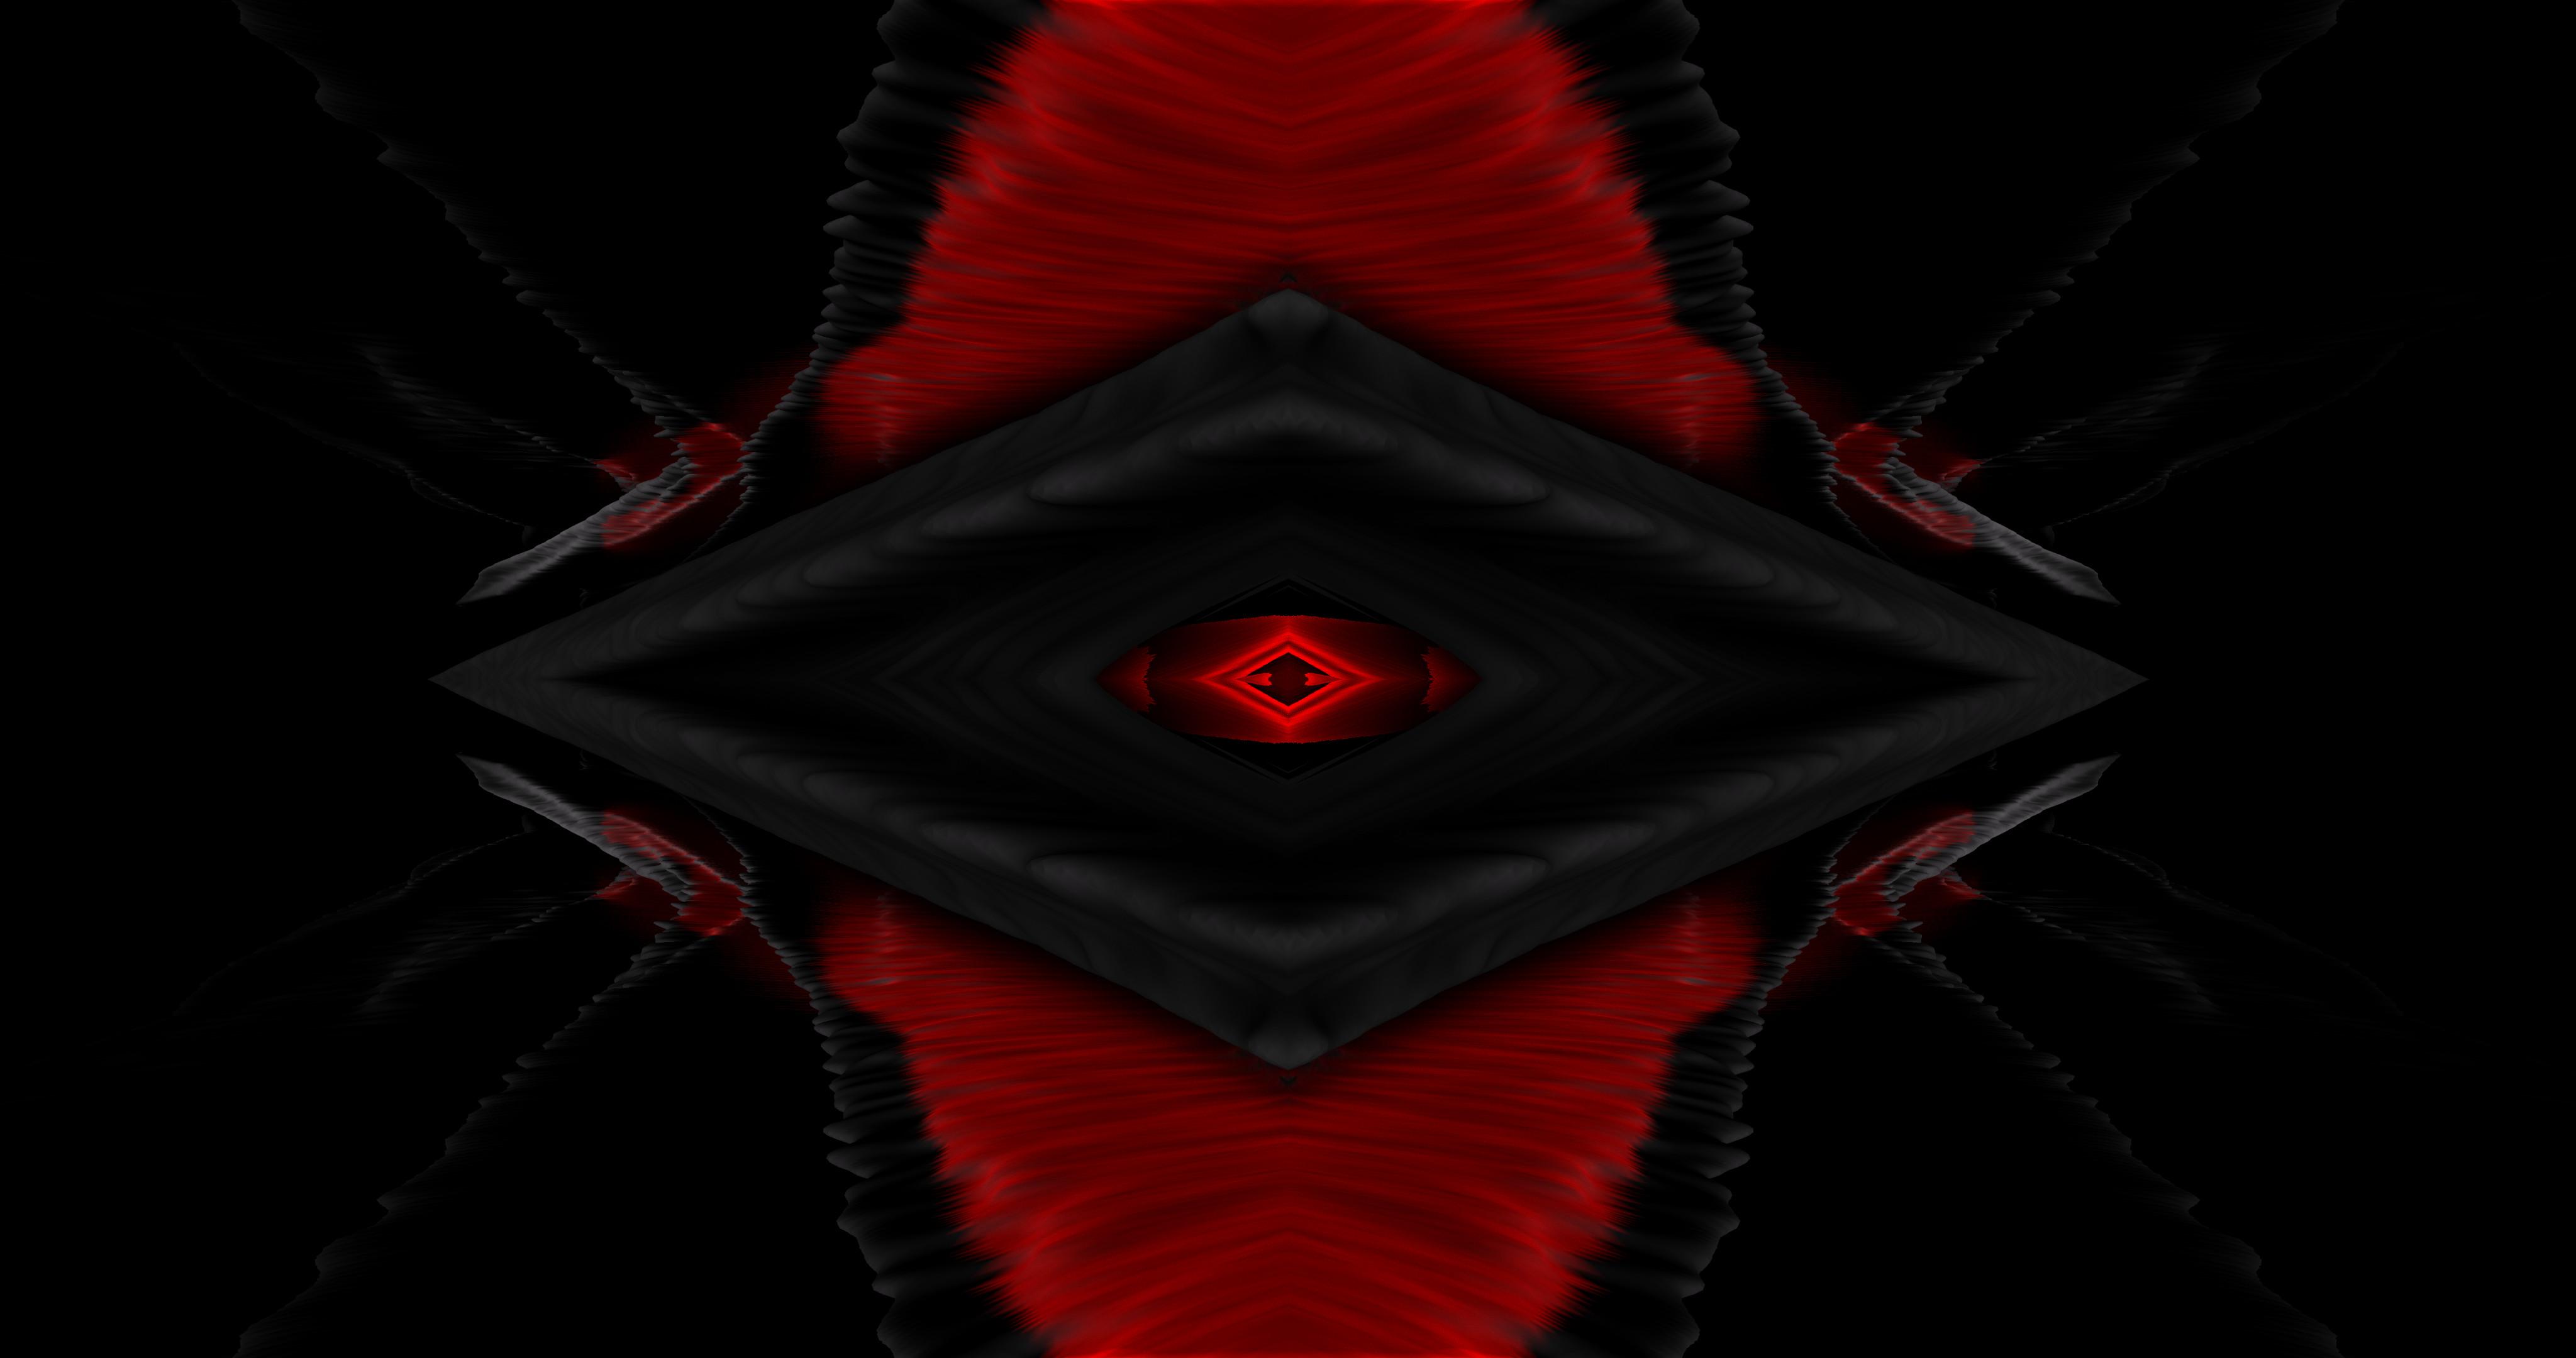 FREE redEYE 4K Wallpaper by XxStryveRxX